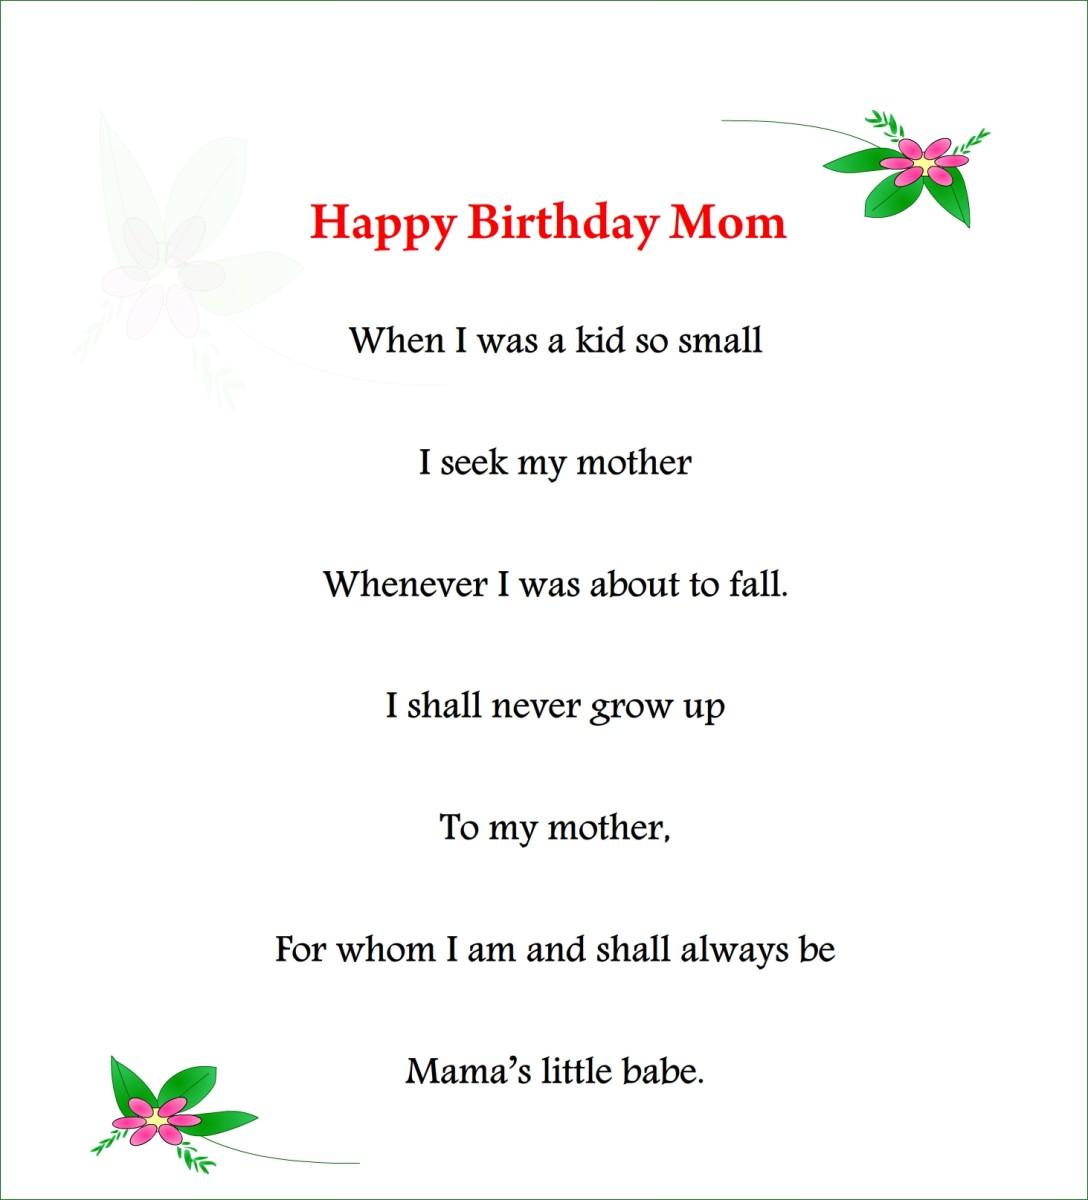 poem mom birthday poems mom birthday poems mom birthday poems mom 3NI4pZqI